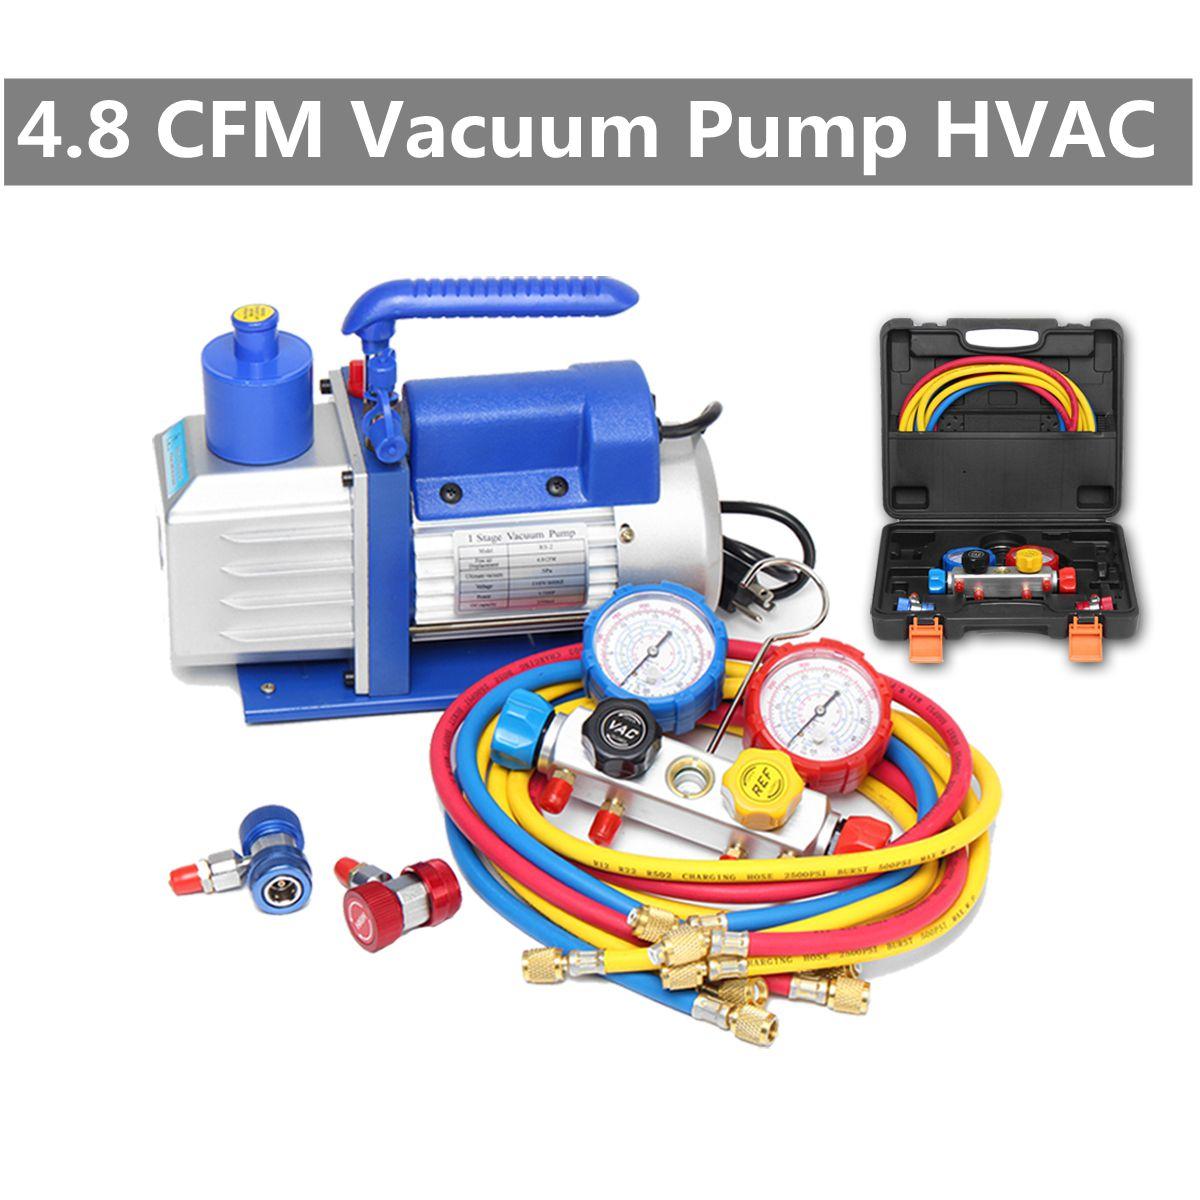 4.8cfm Vakuum Pumpe R134a R22 R410a Hva/c Kältemittel W/4 Ventil Manifold Gauge Pumpen Teile Mini Vakuum Pumpe Für Klimaanlage Sanitär